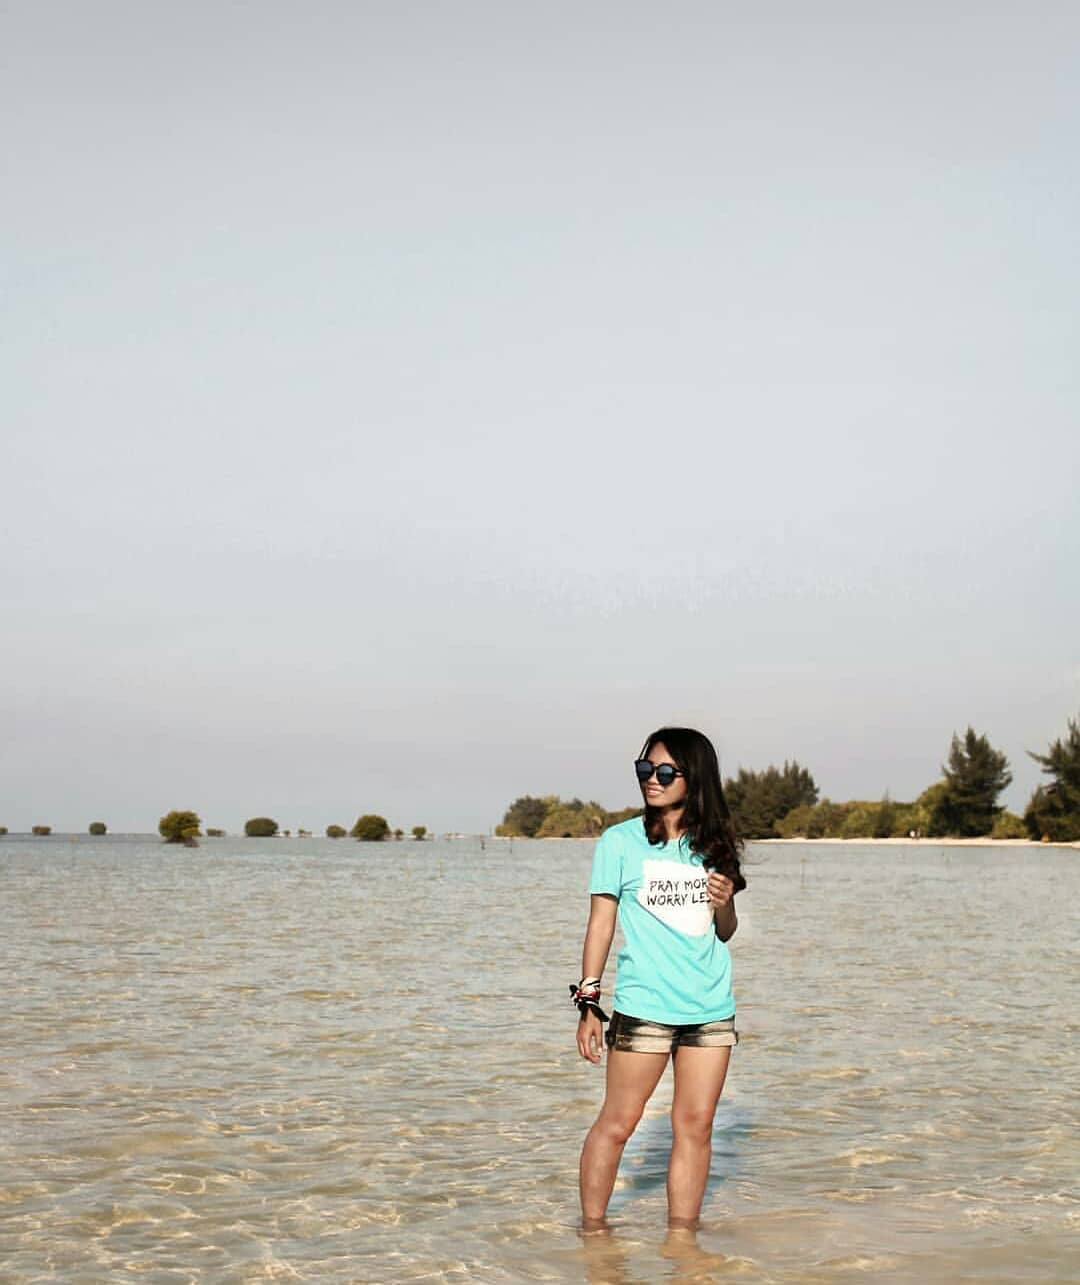 Thousand Islands Jakarta Day Trip Destination Idea!